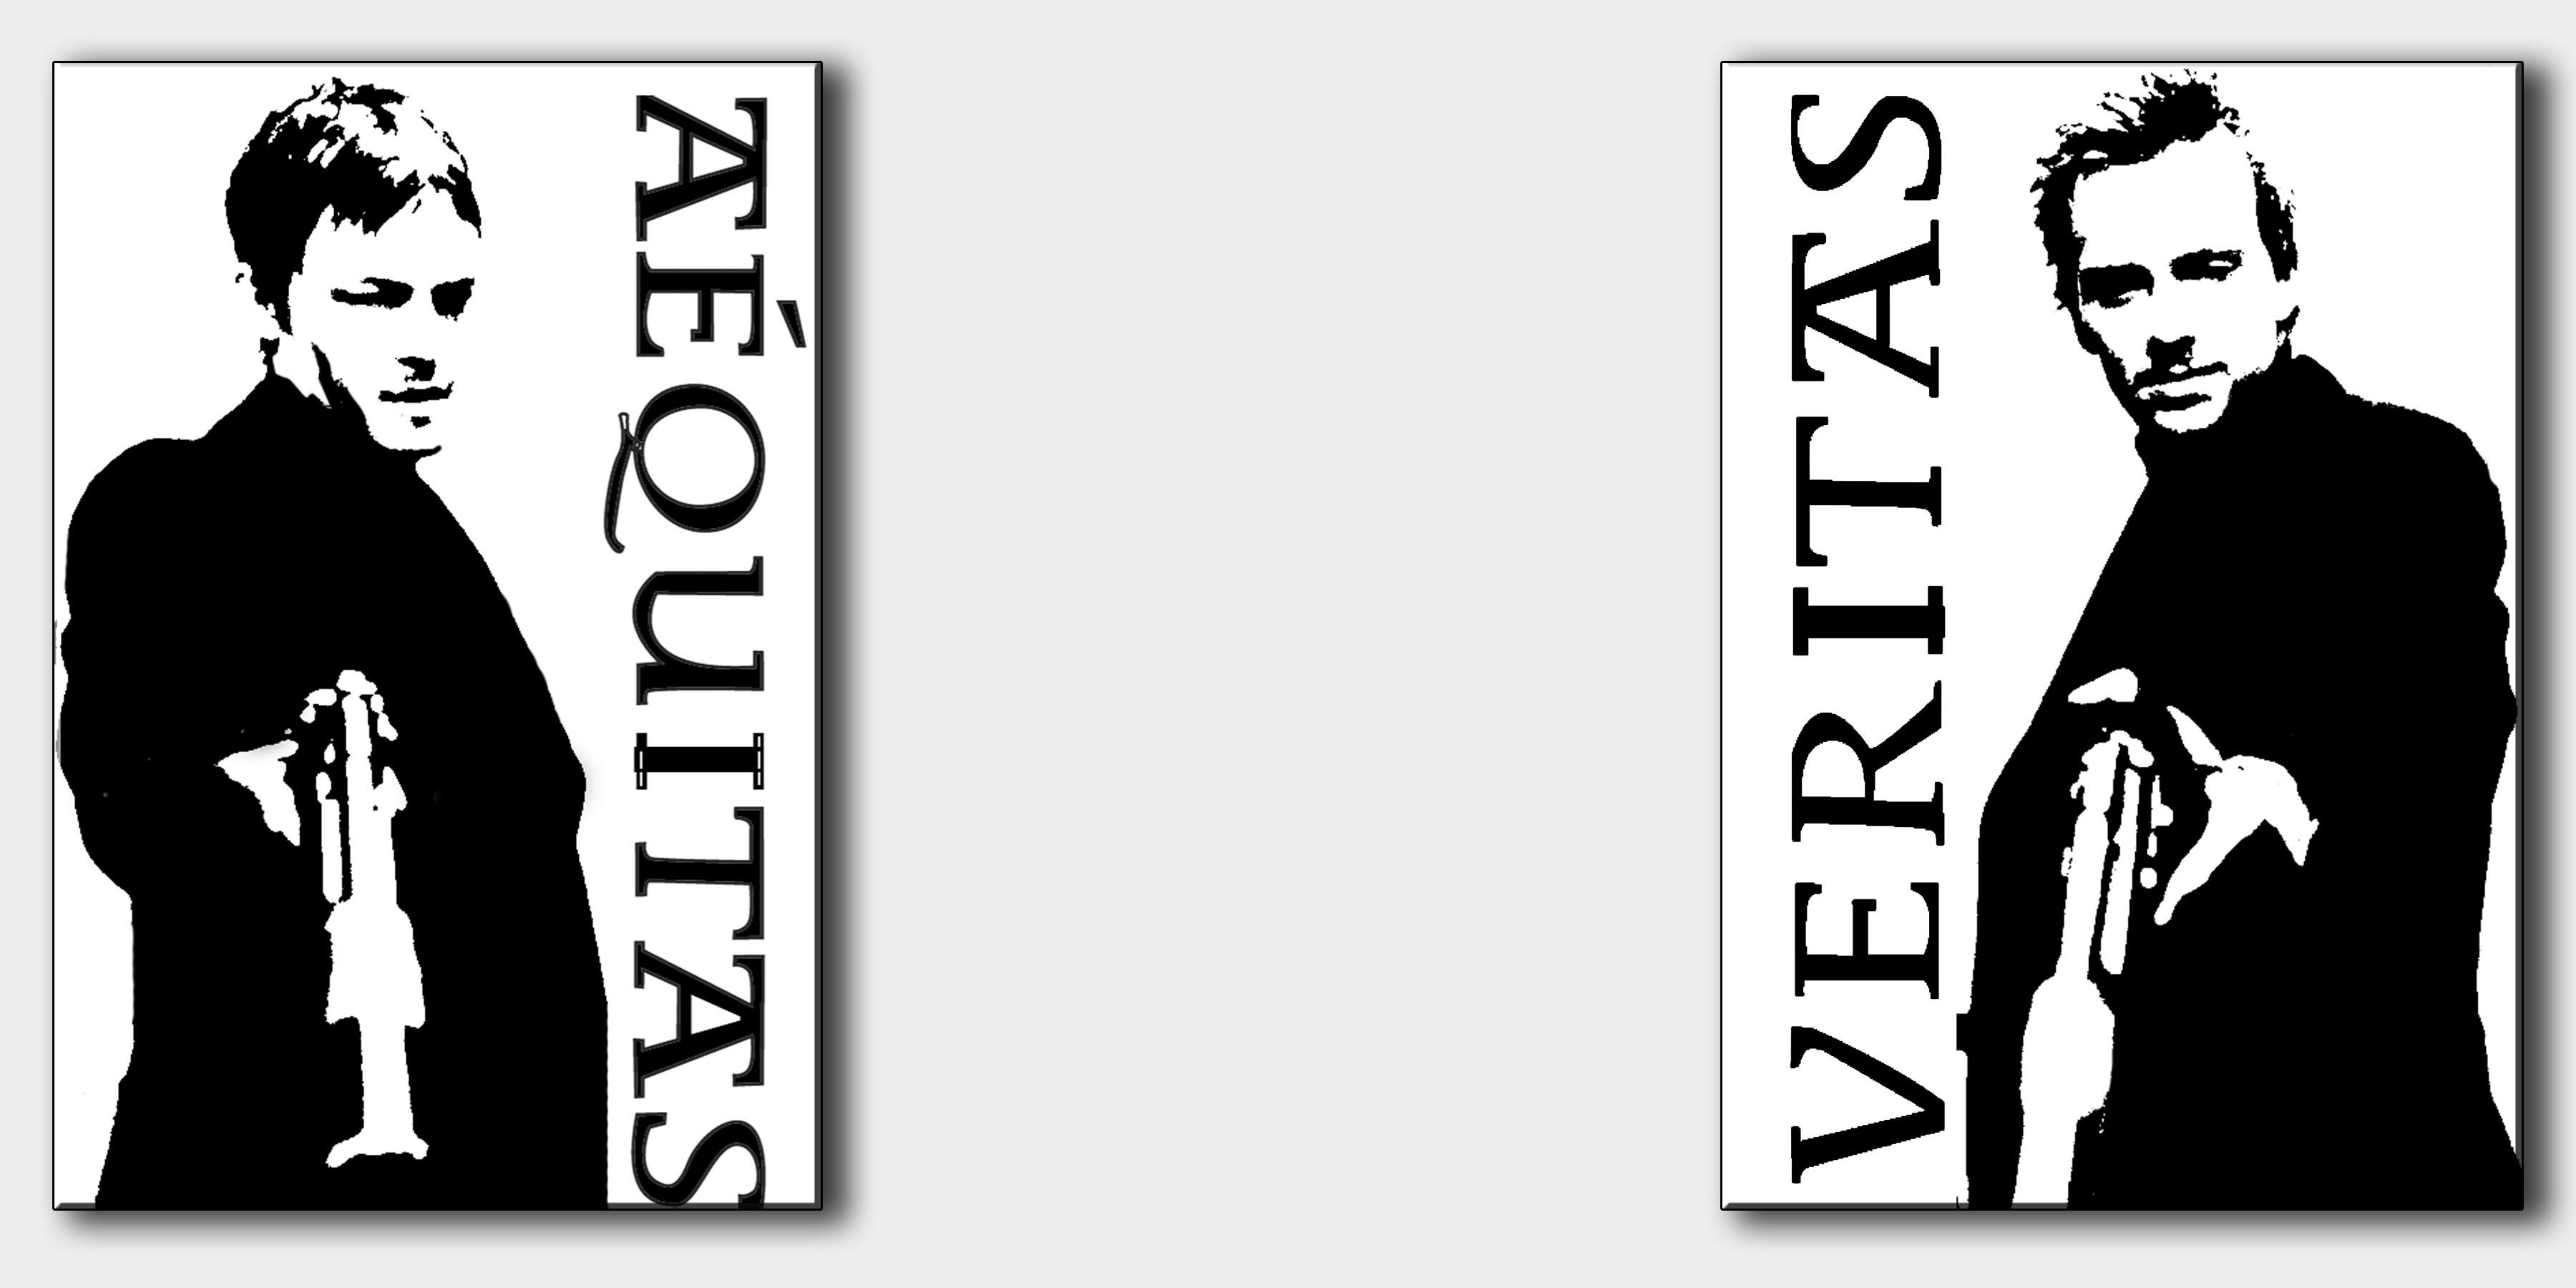 Pin boondock saints prayer 1366 768 wallpaper on pinterest for Boondock saints veritas aequitas tattoos